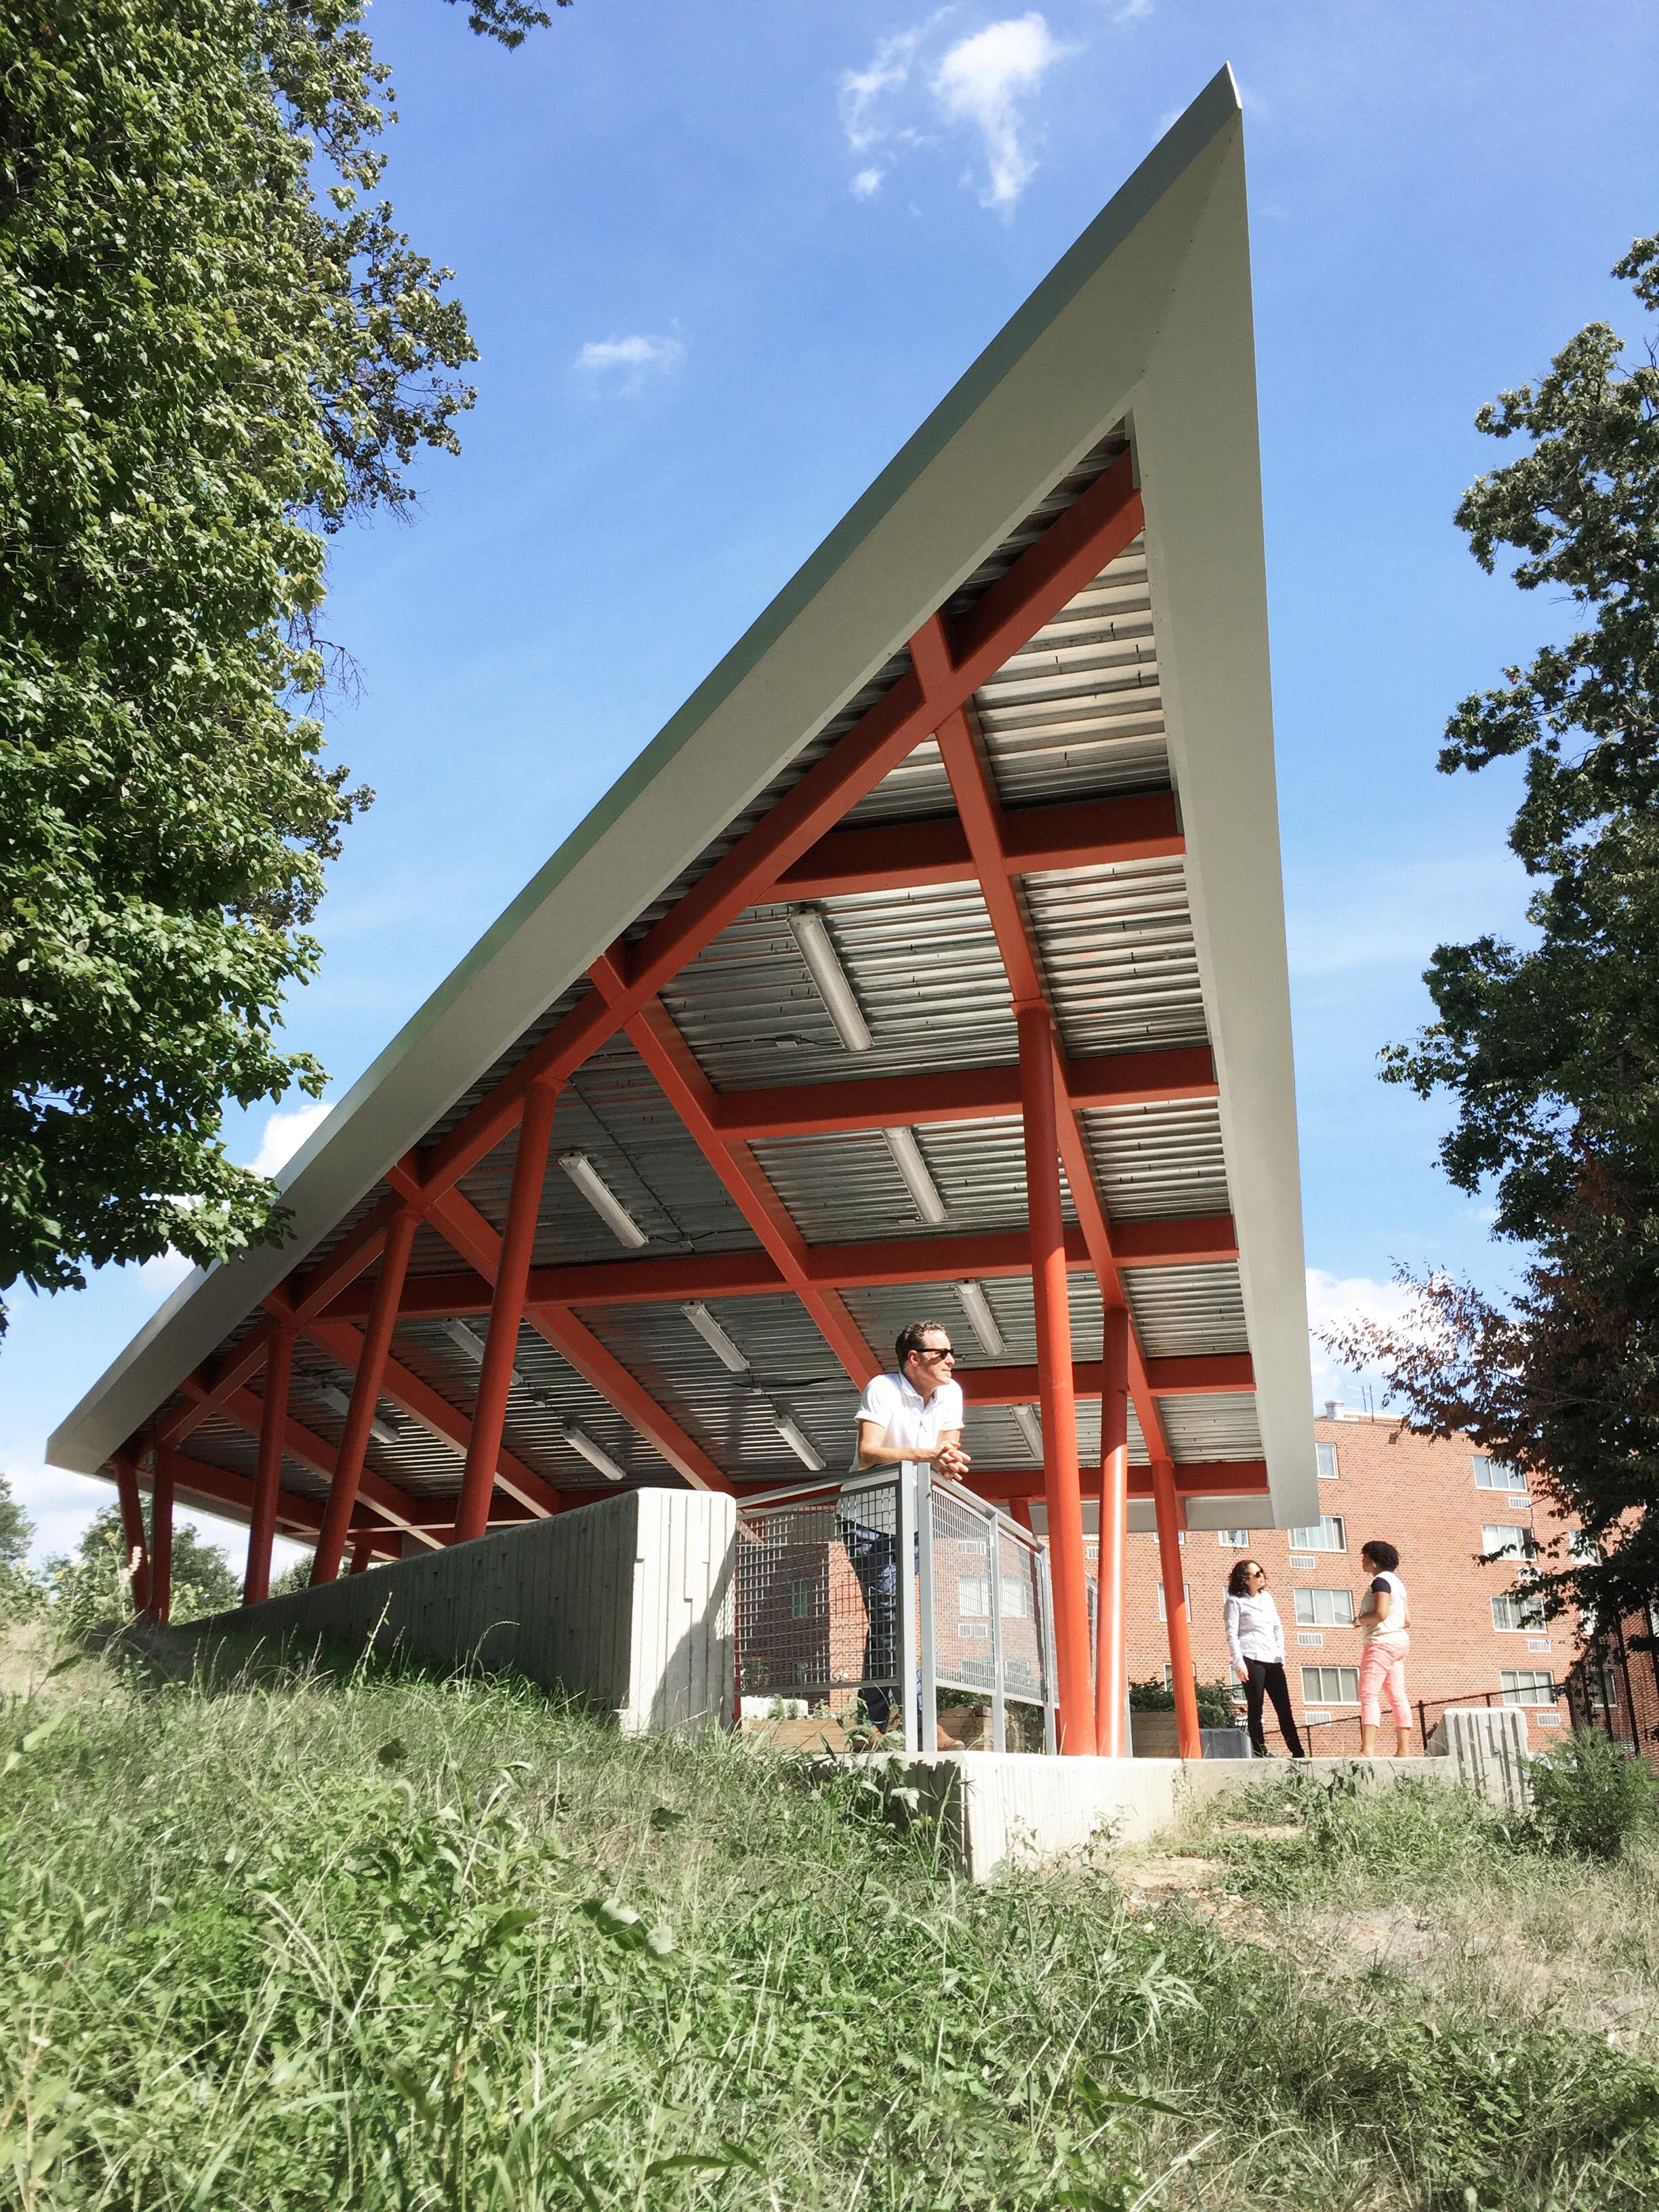 Twin Oaks Pavilion - AIA DC Universal Design Award